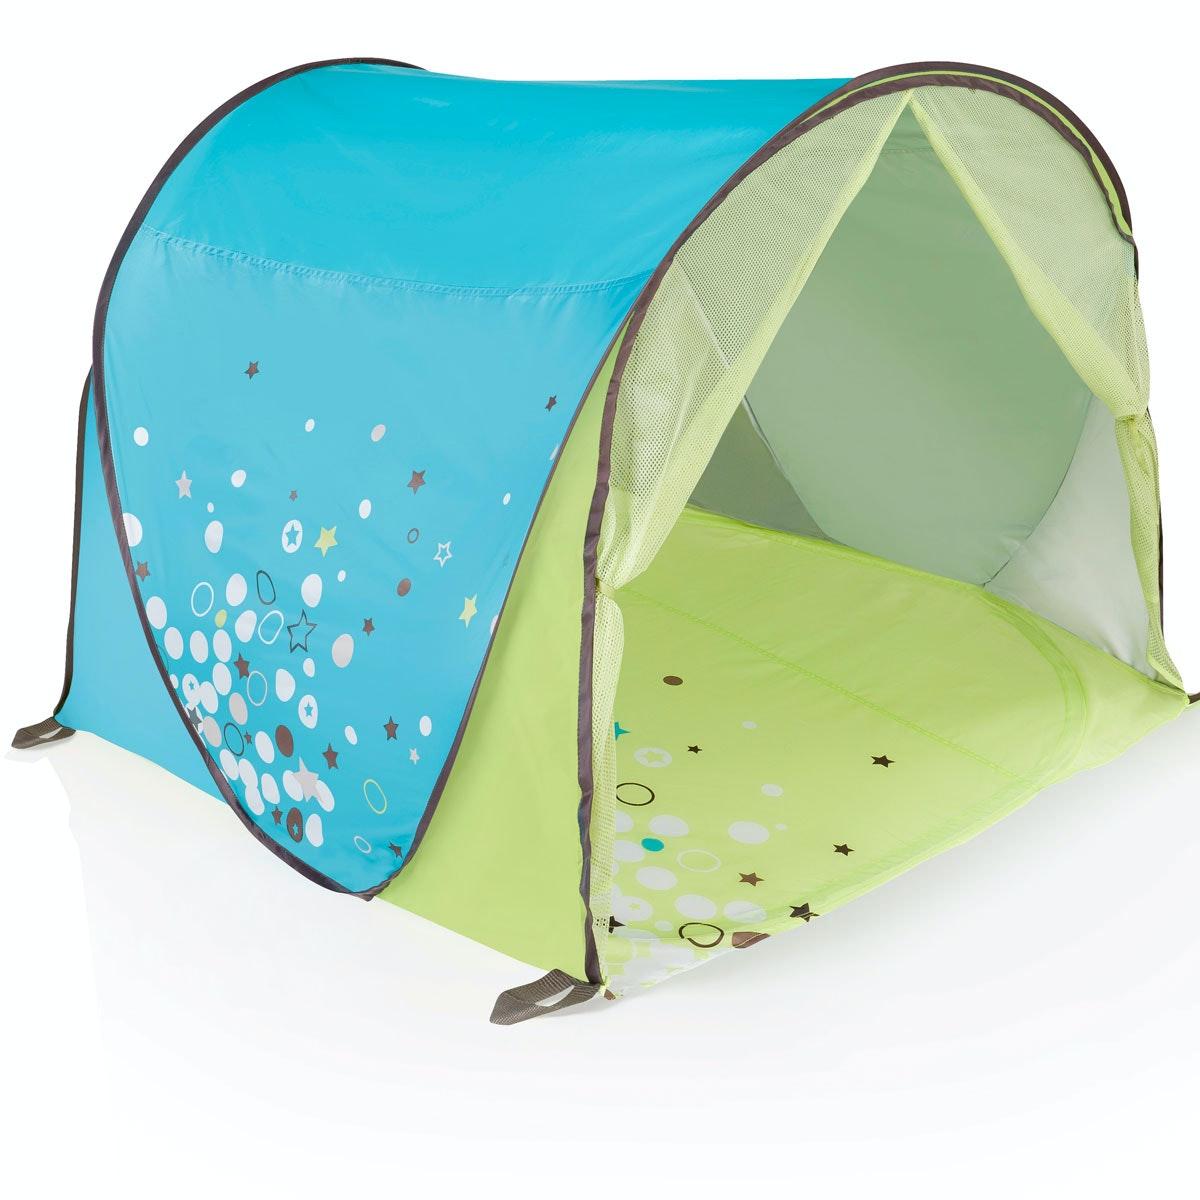 voilage anti uv affordable casasmart tente de jardin ronde avec rideaux with voilage anti uv. Black Bedroom Furniture Sets. Home Design Ideas